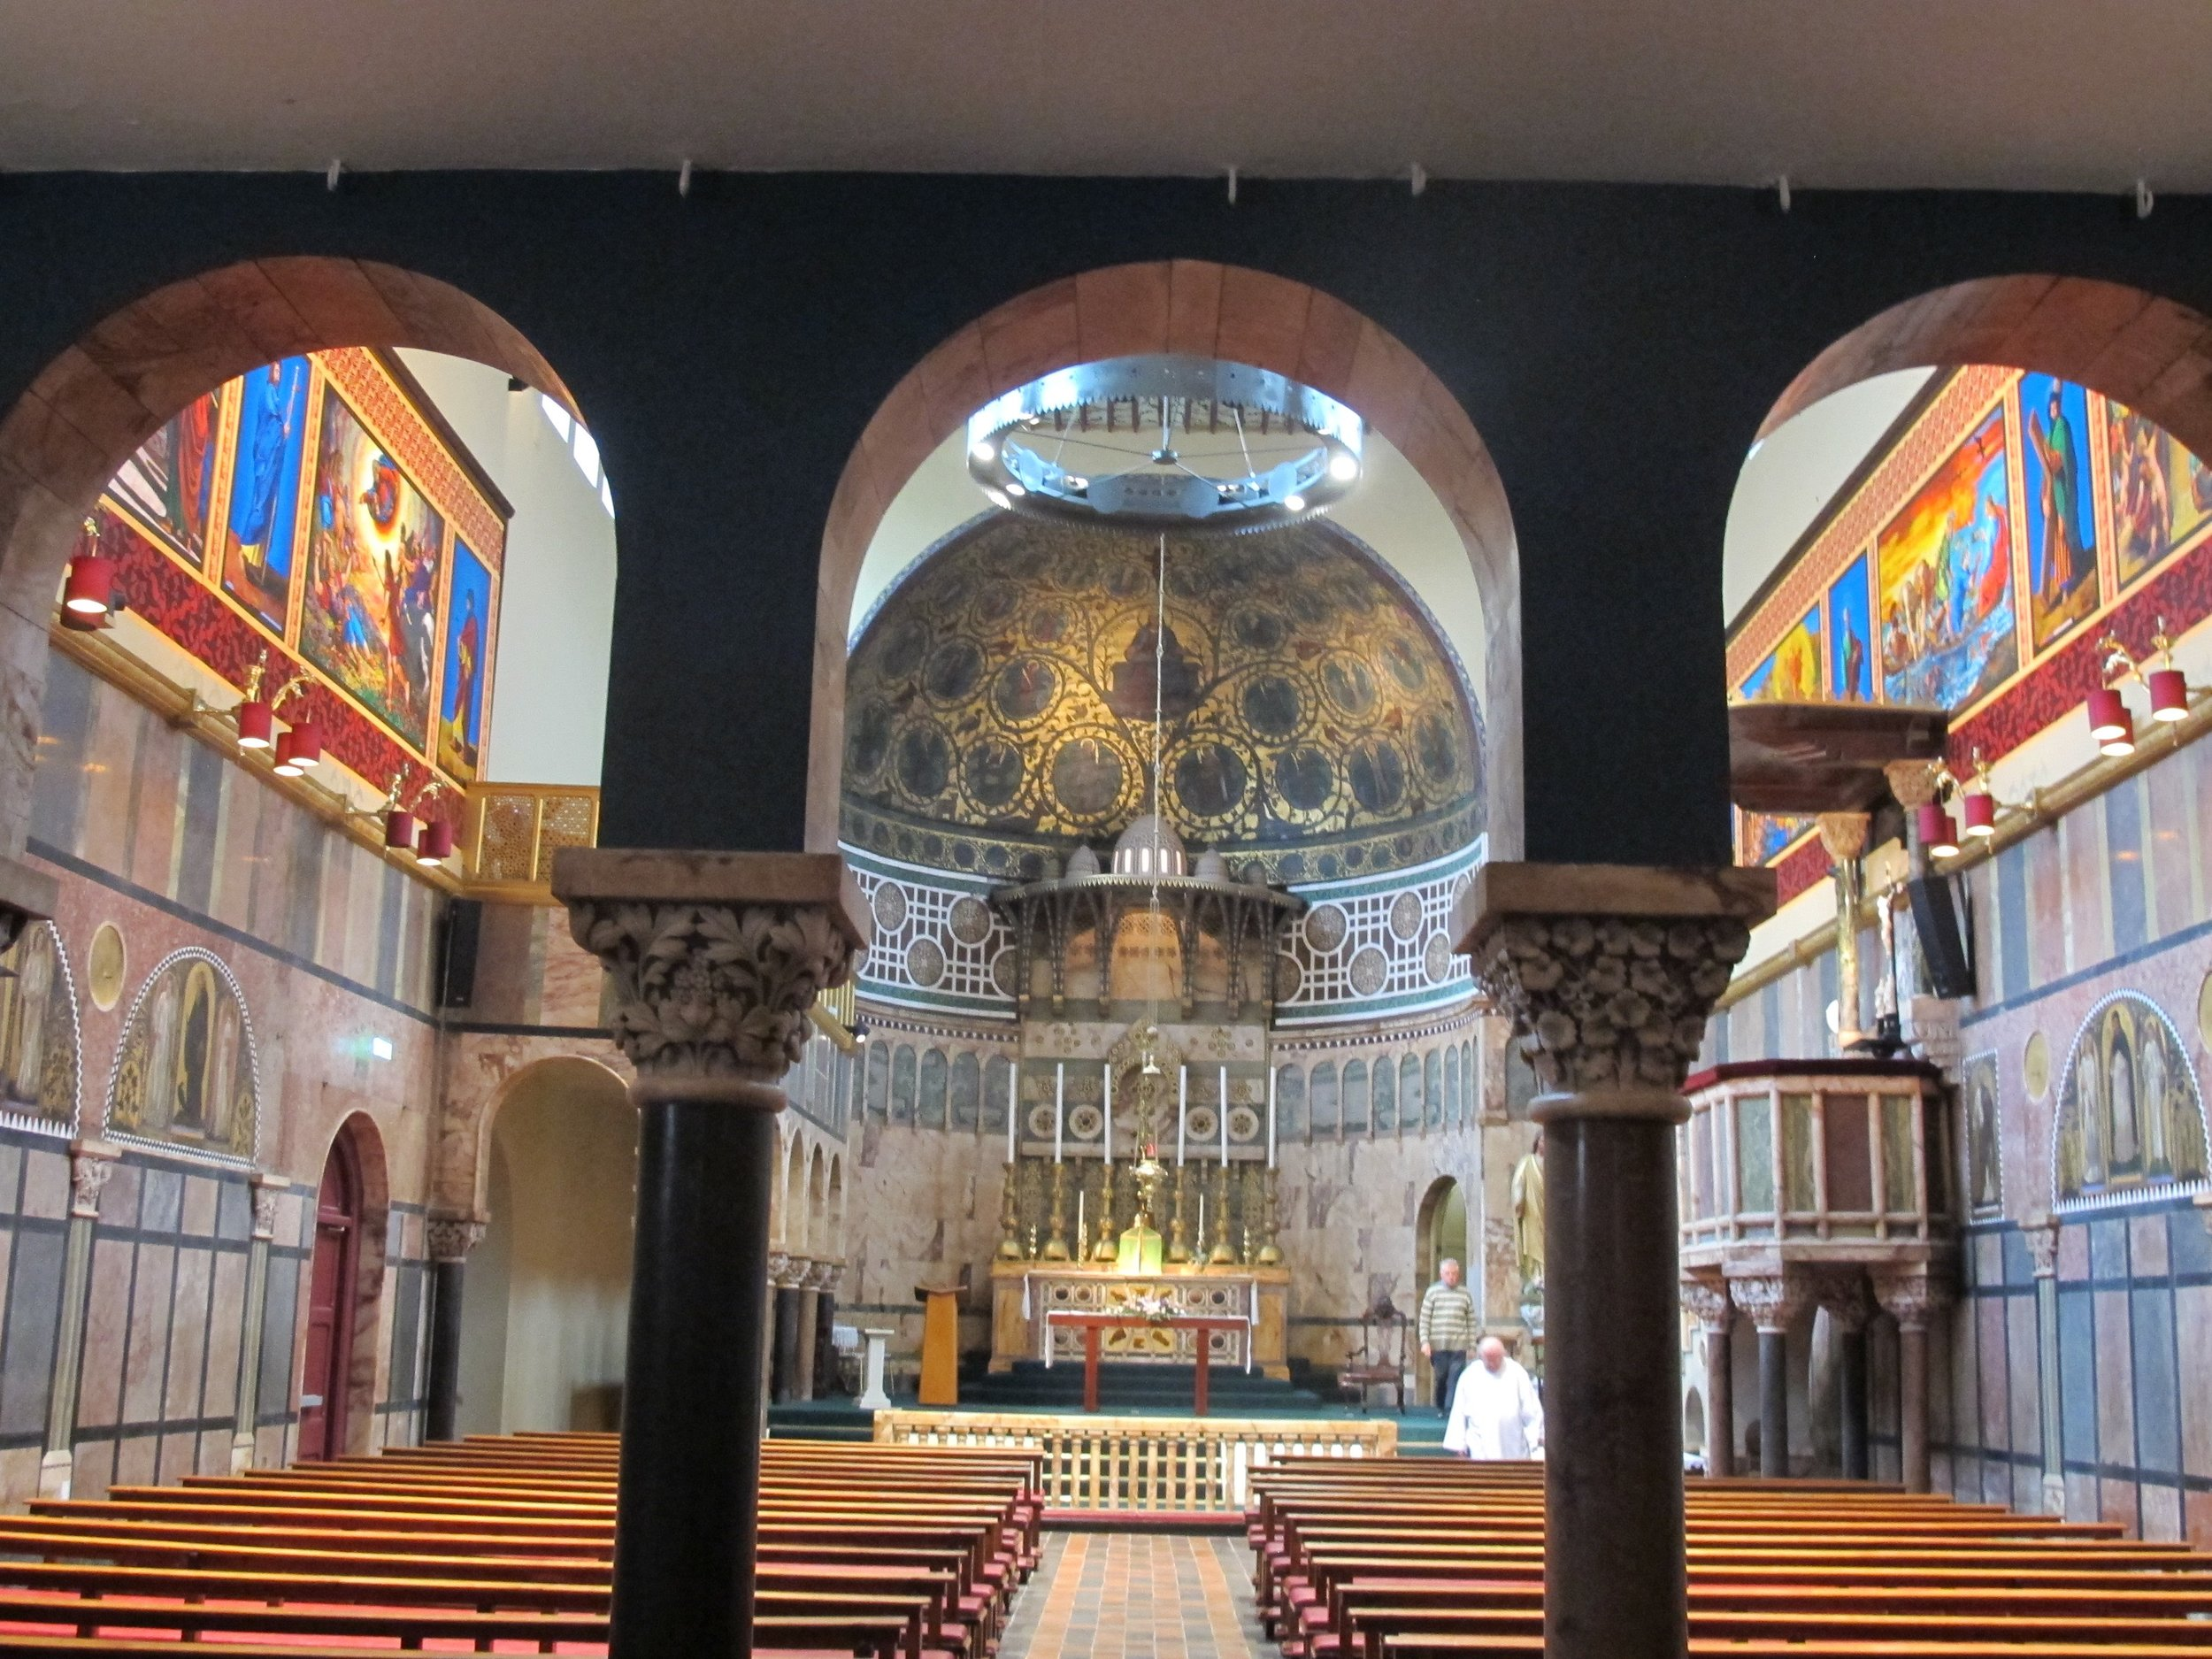 University Church Installation #4